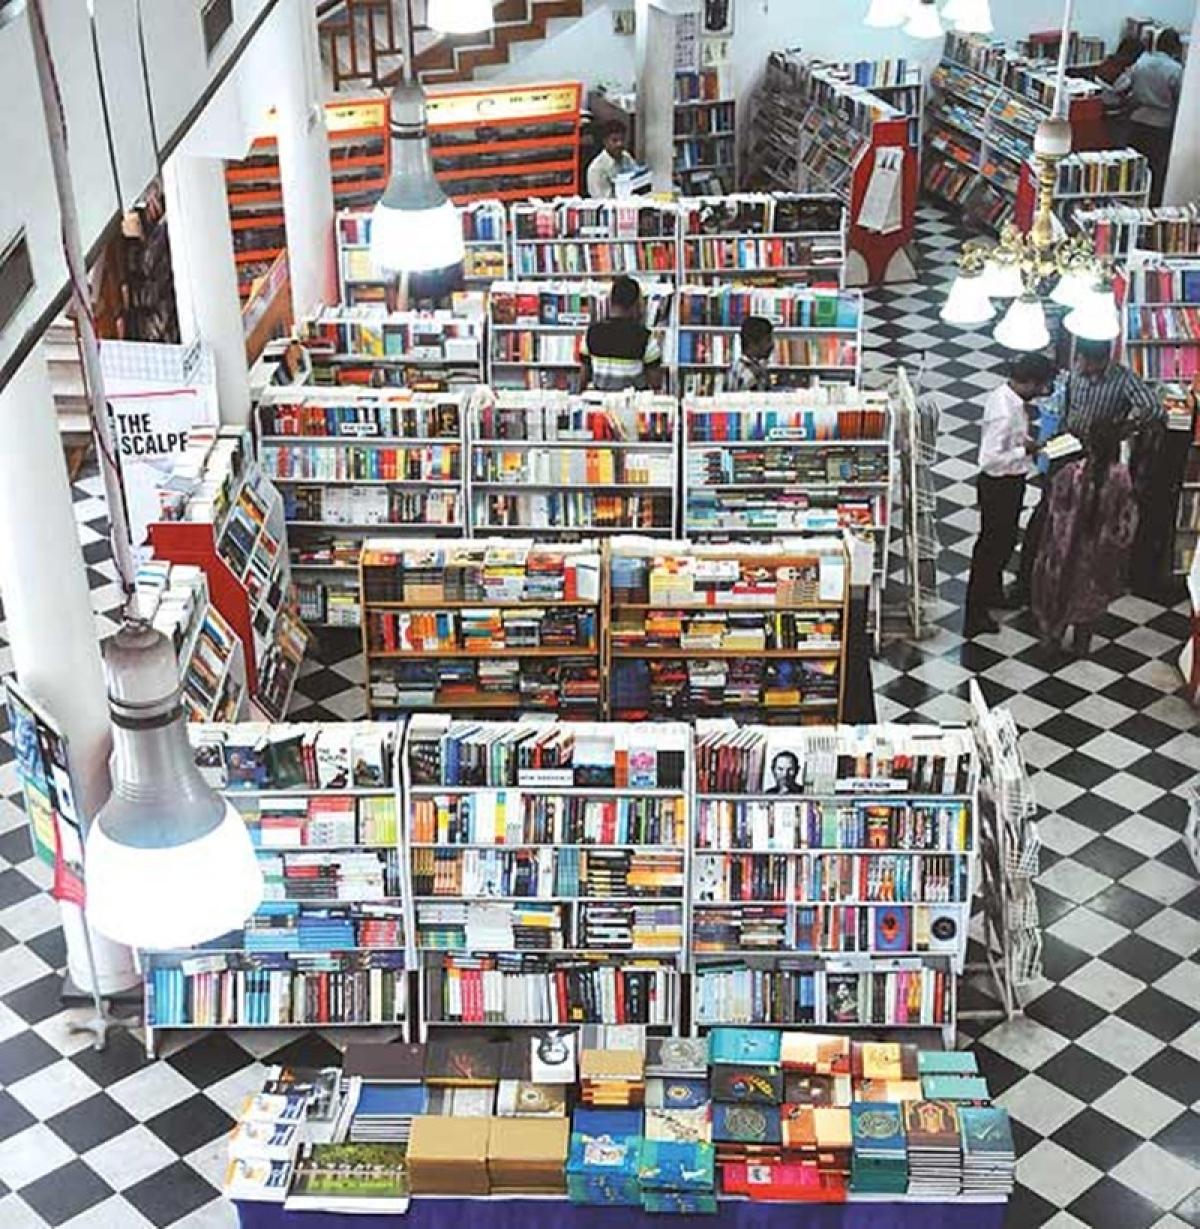 Higginbothams: Higginbothams is one of country's oldest surviving bookstores, Kolkatta